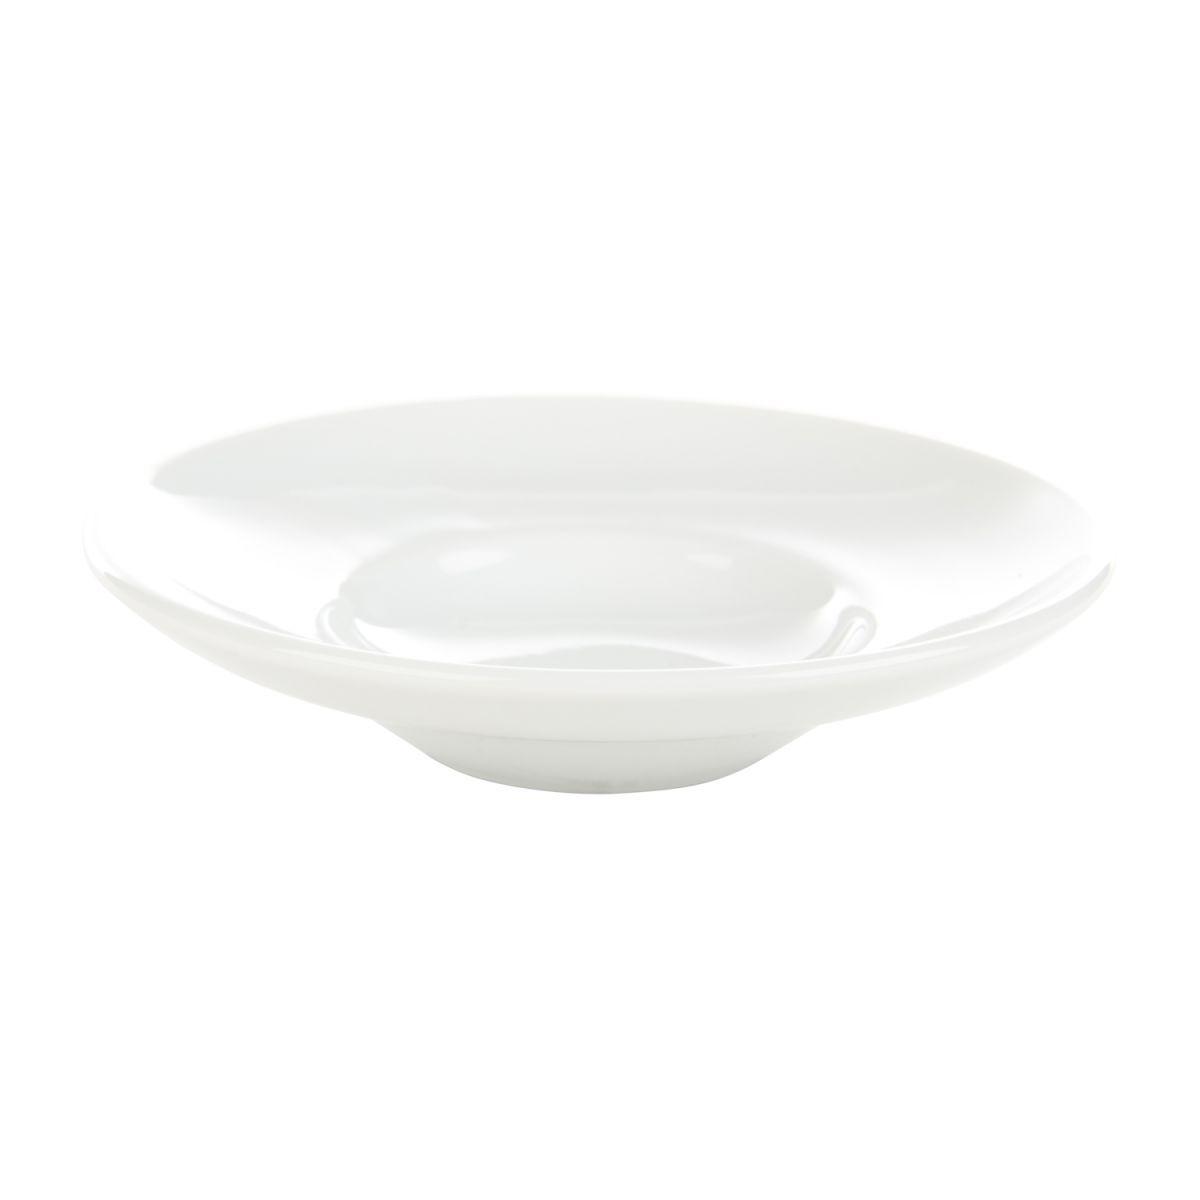 plate pasta 27 cm box6